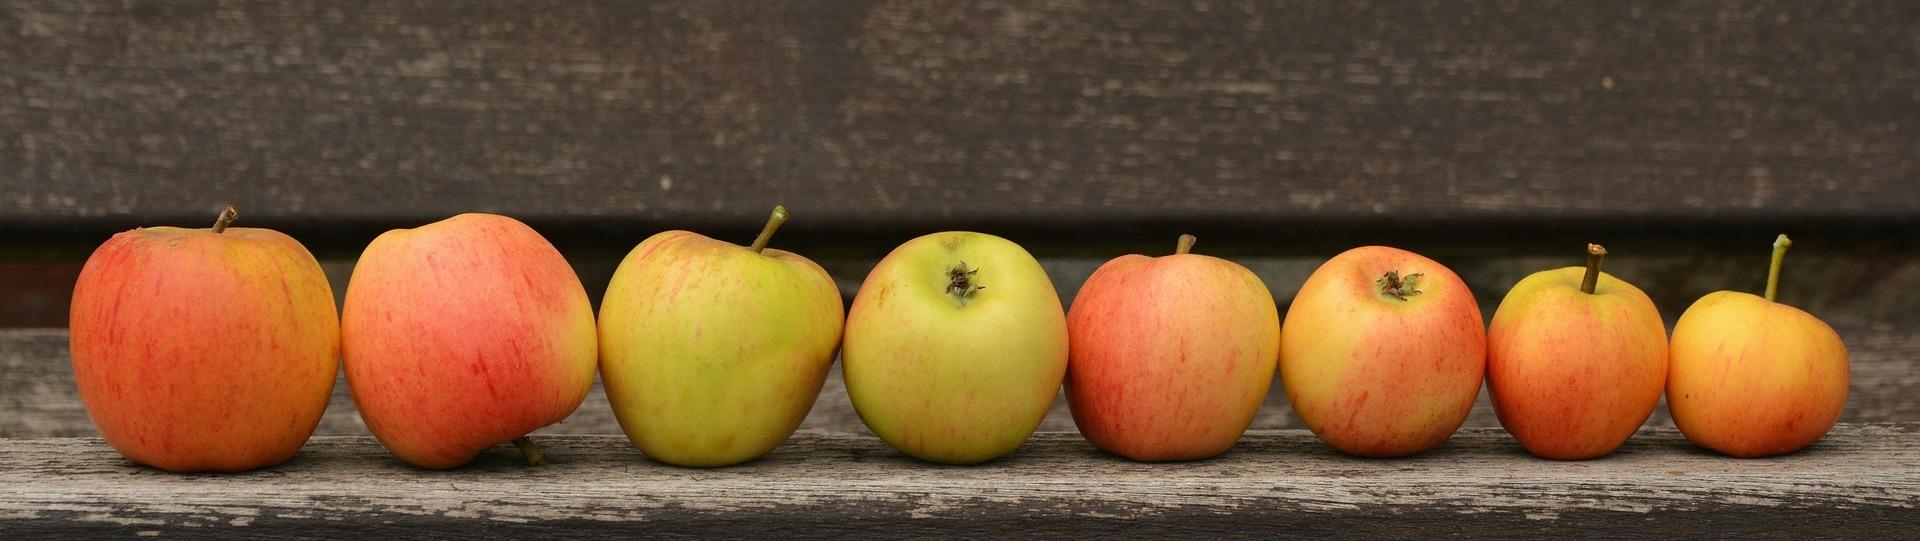 Apple 1675775 1920